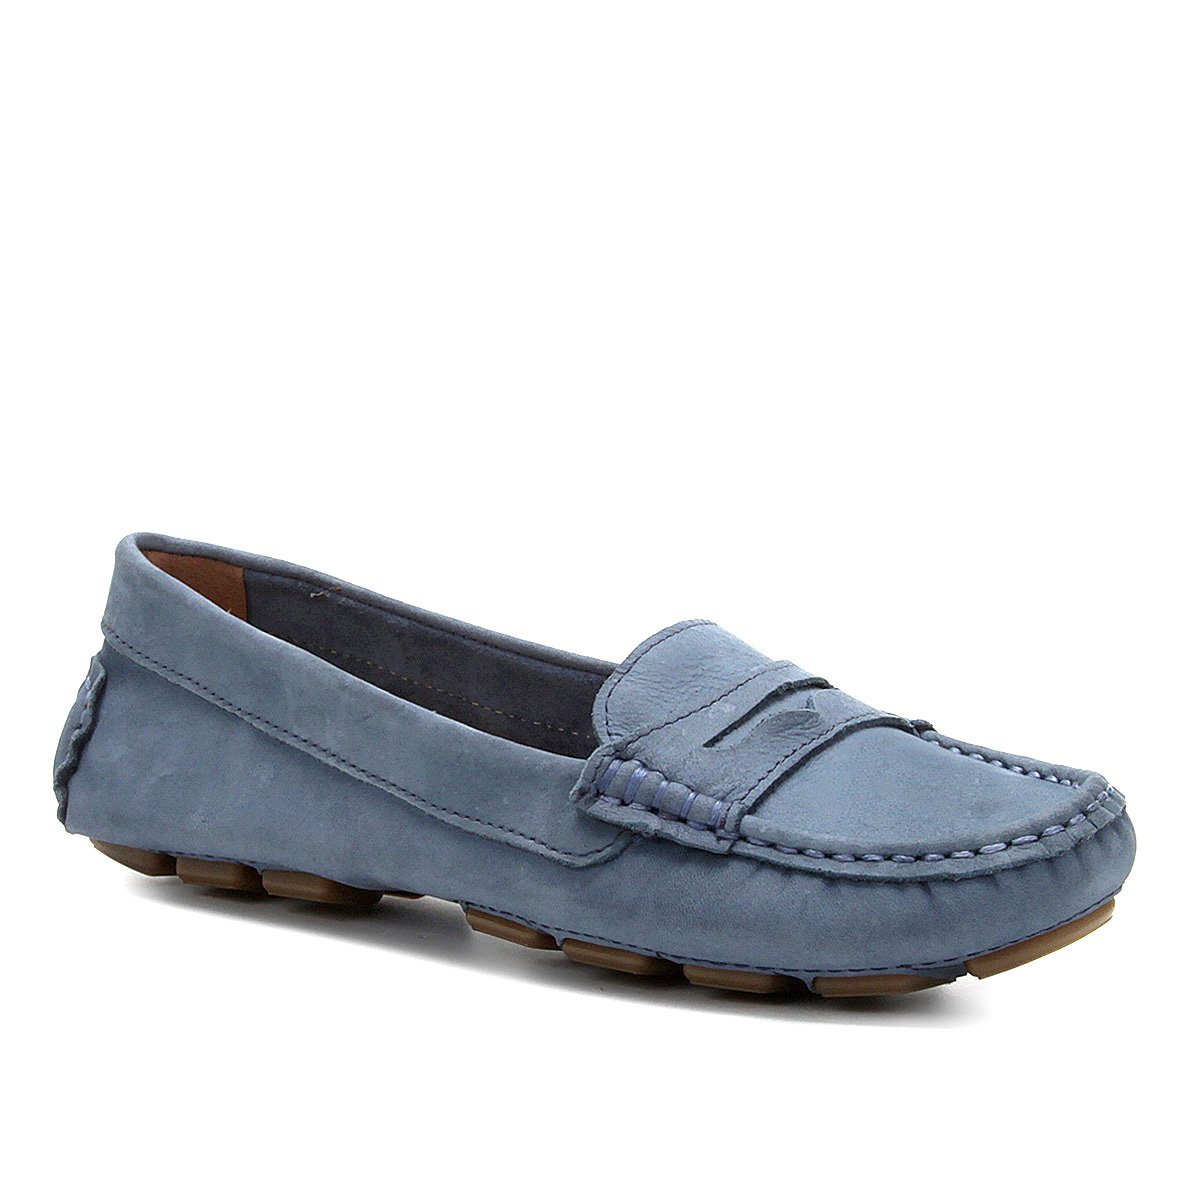 ef42de24d9 Mocassim Couro Shoestock Drive Nobuck Feminino - Azul